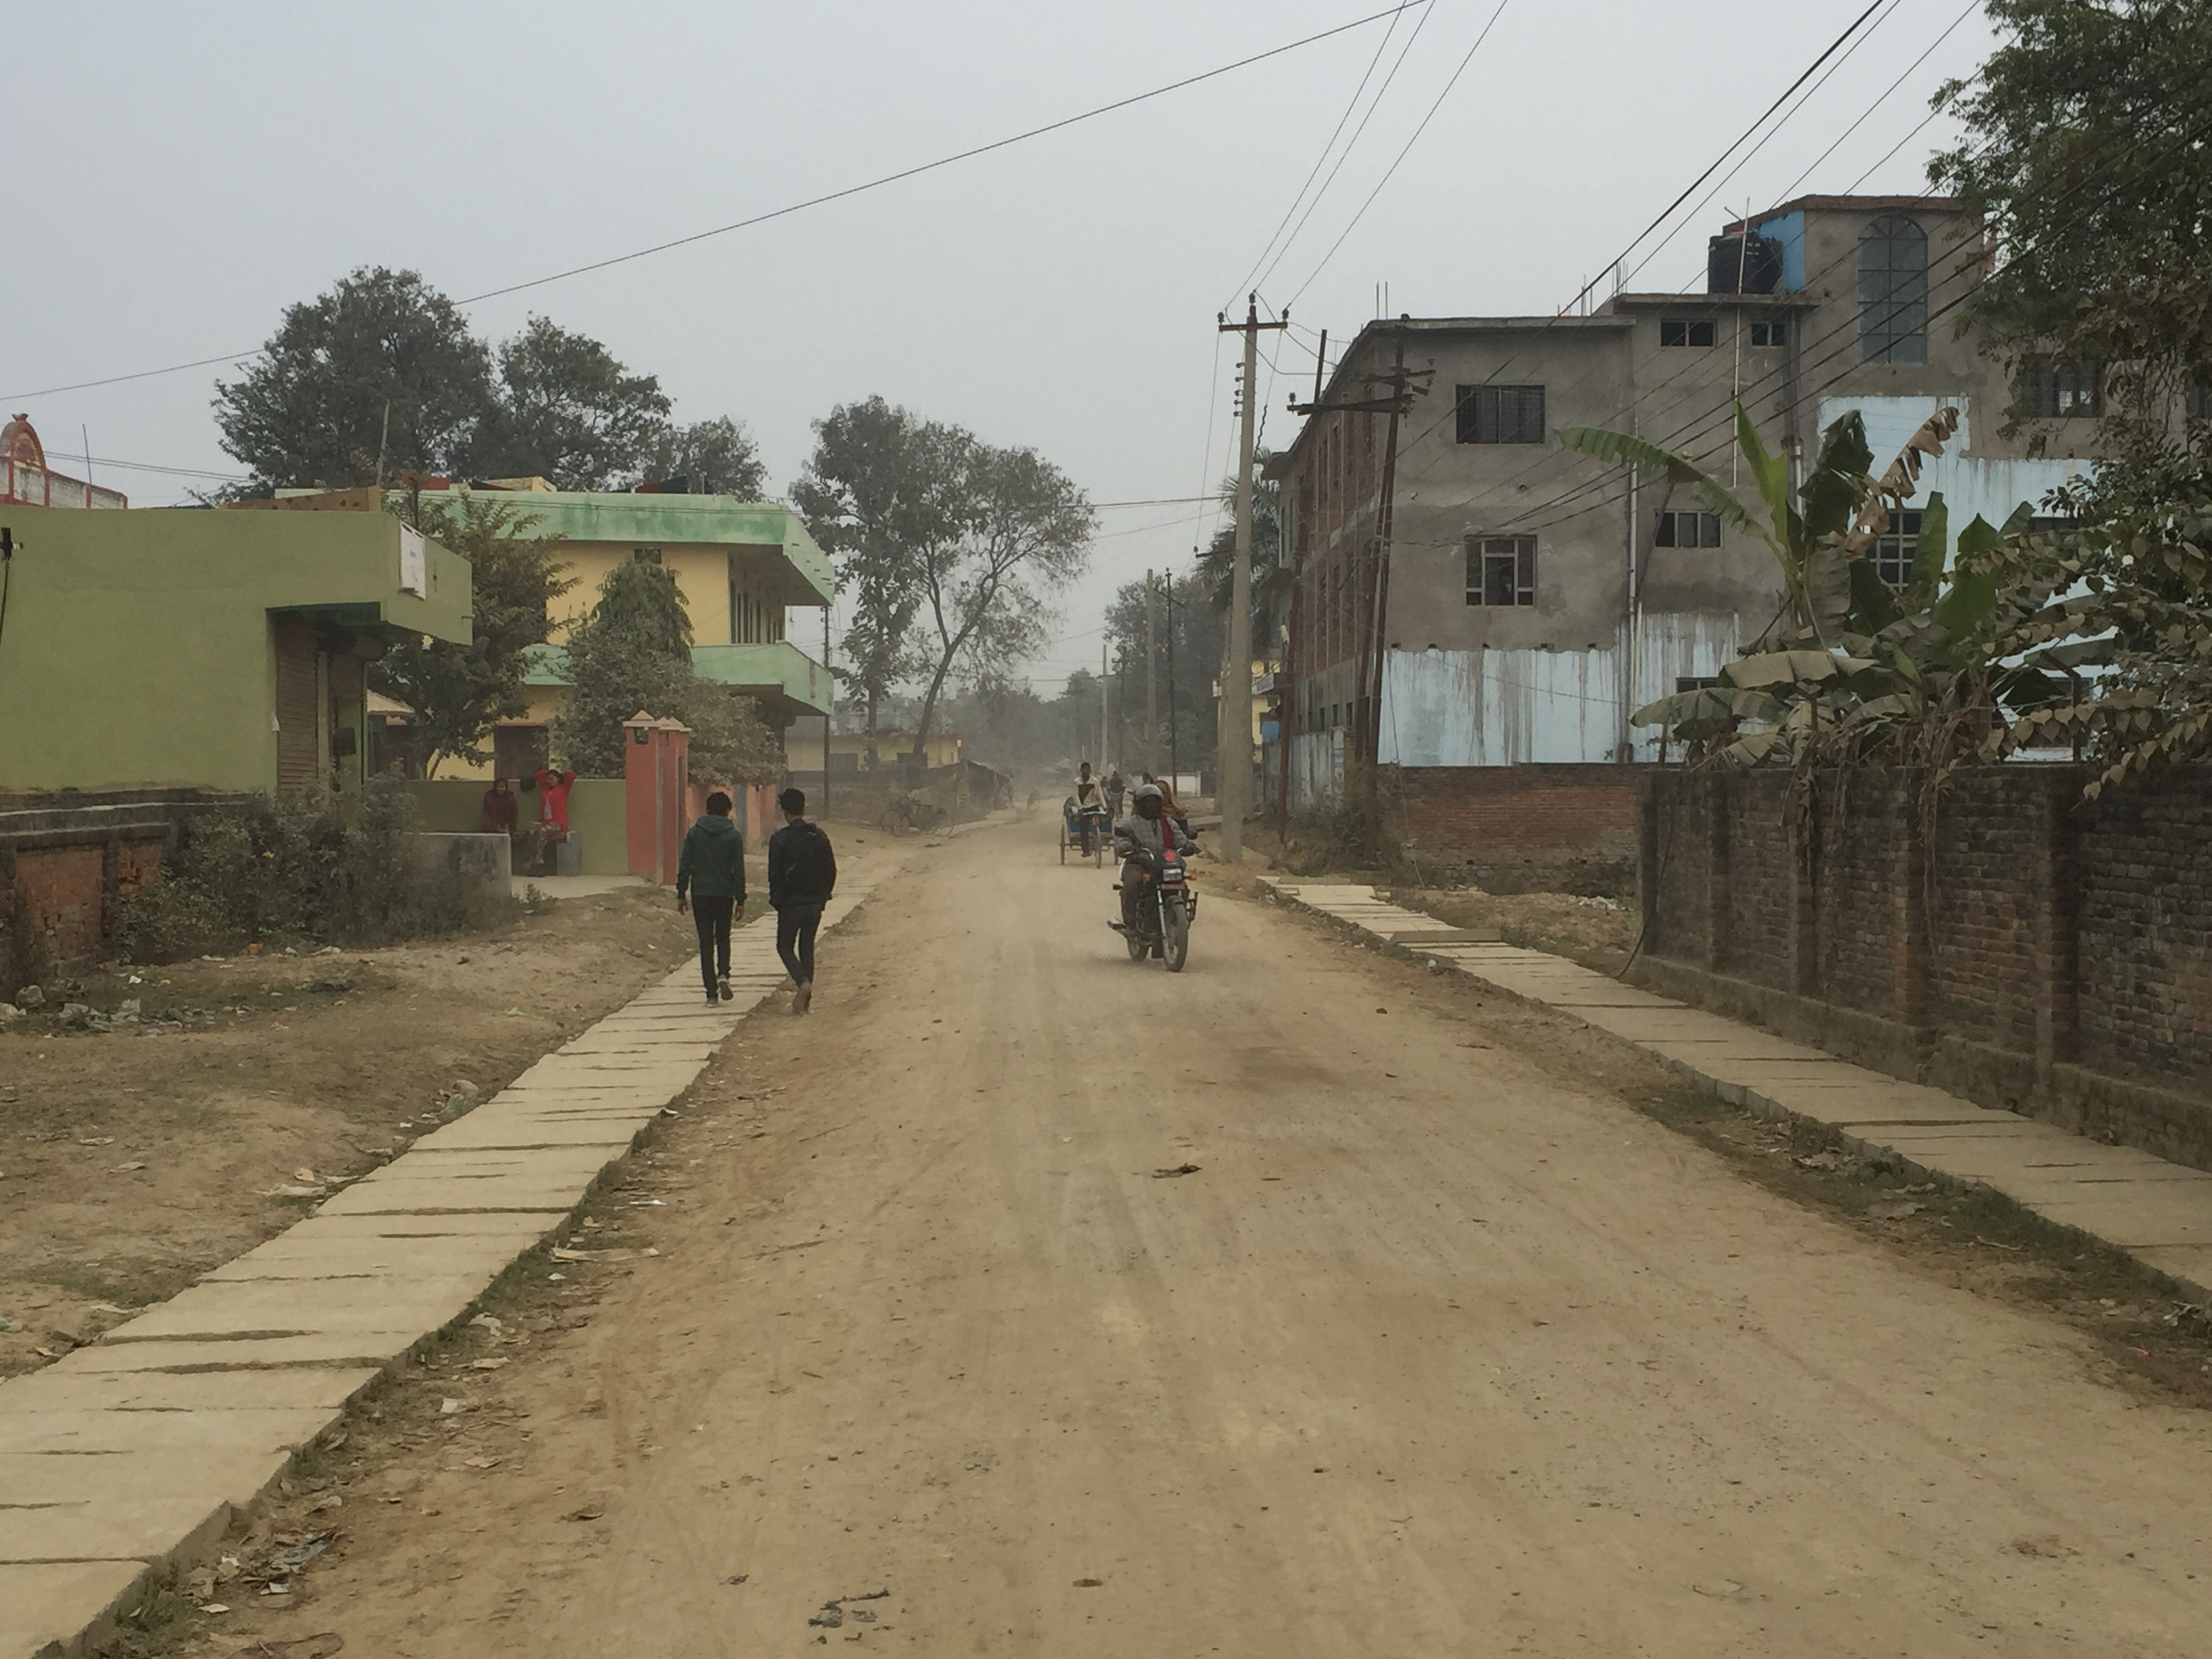 Large Plot available for sale in Banke Gaon, Nepalgunj – Banke – IMG_1969